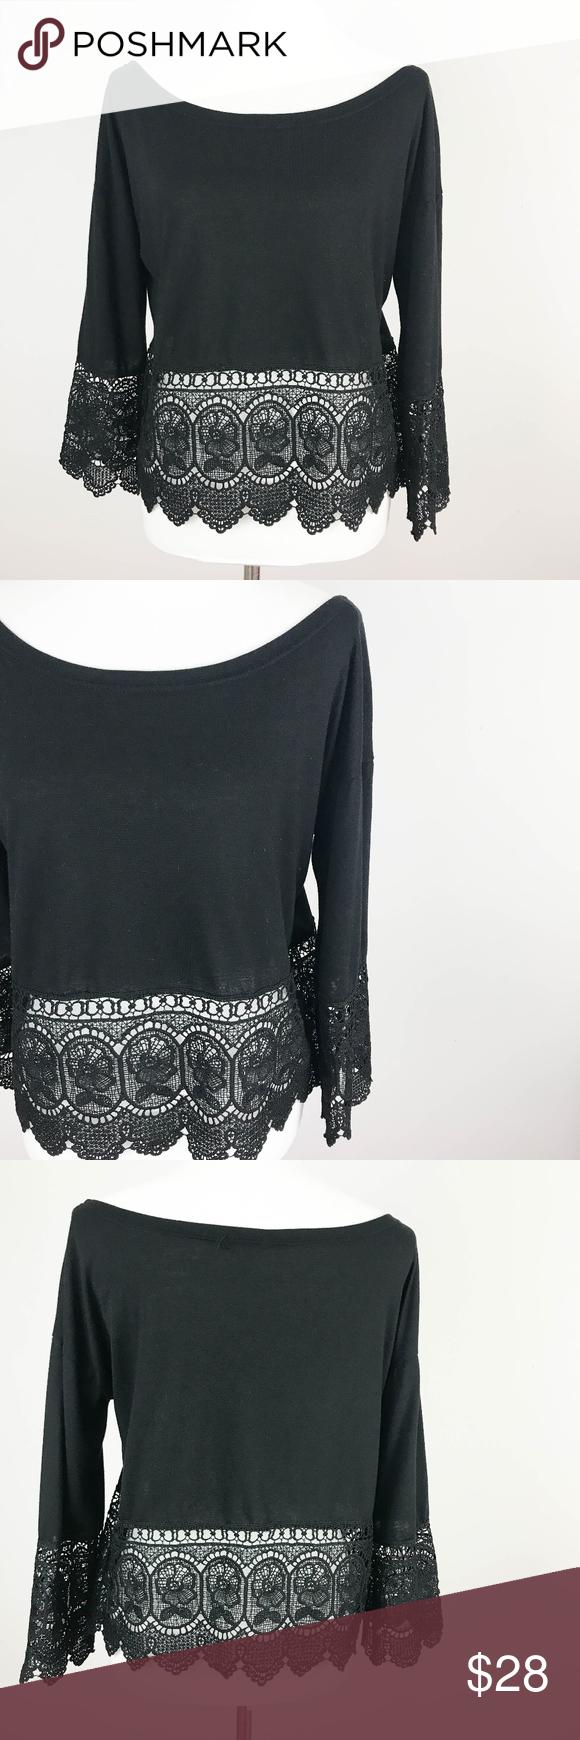 98f1ef749d5f42 Mix Max Knit Crop Top Large Black Sheer Crochet Mix Max Women s Knit Crop  Top Large